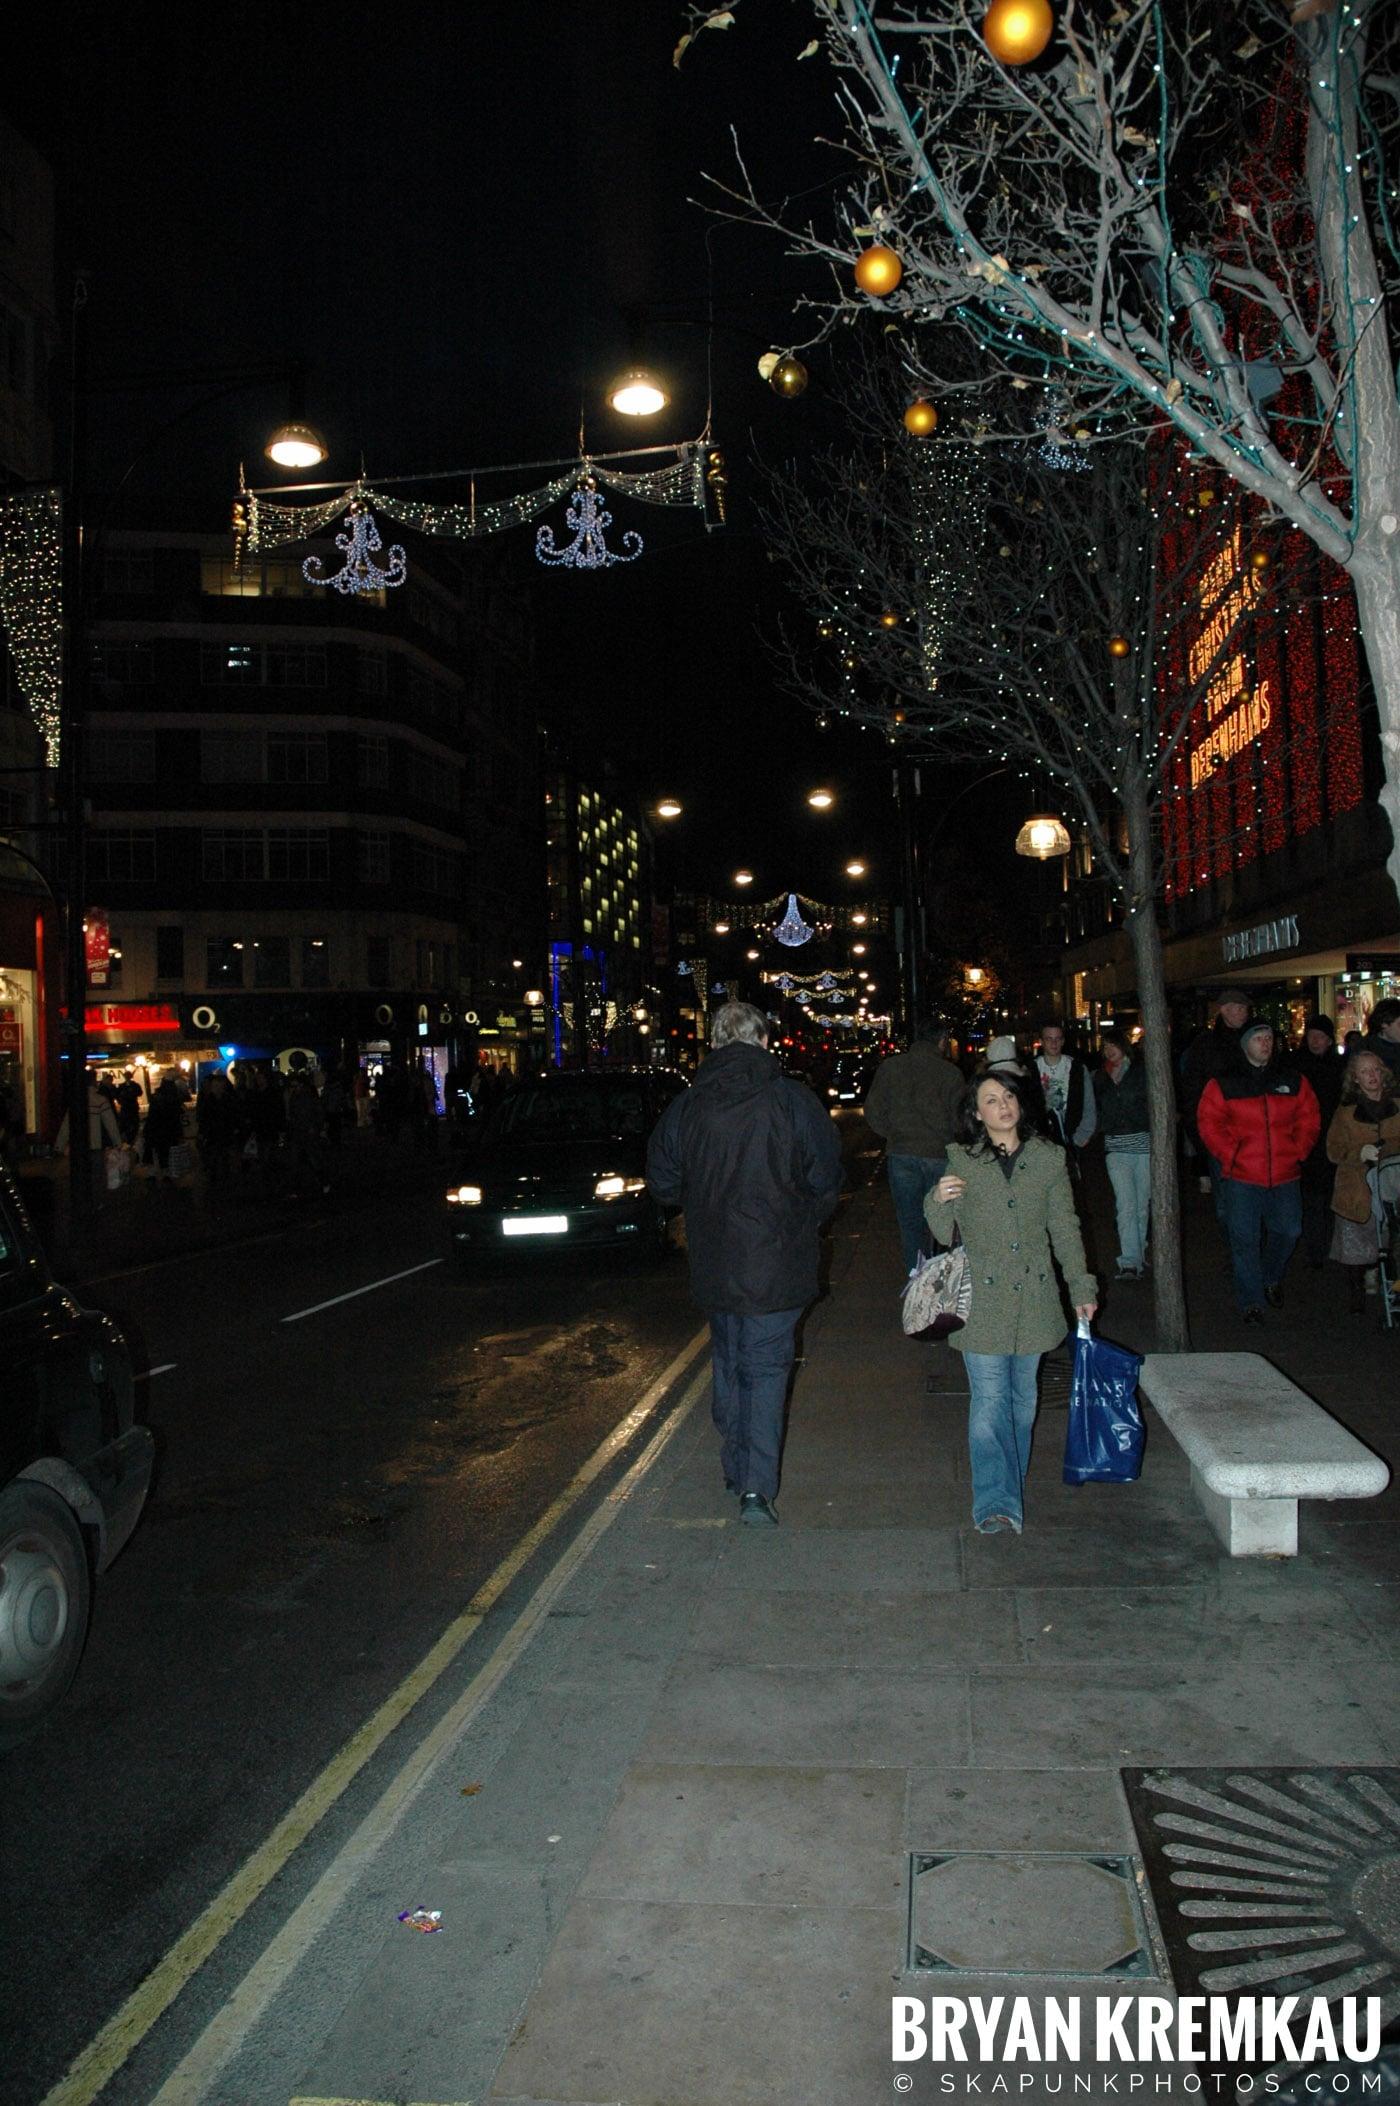 London, England - Day 3 - 12.18.05 (17)